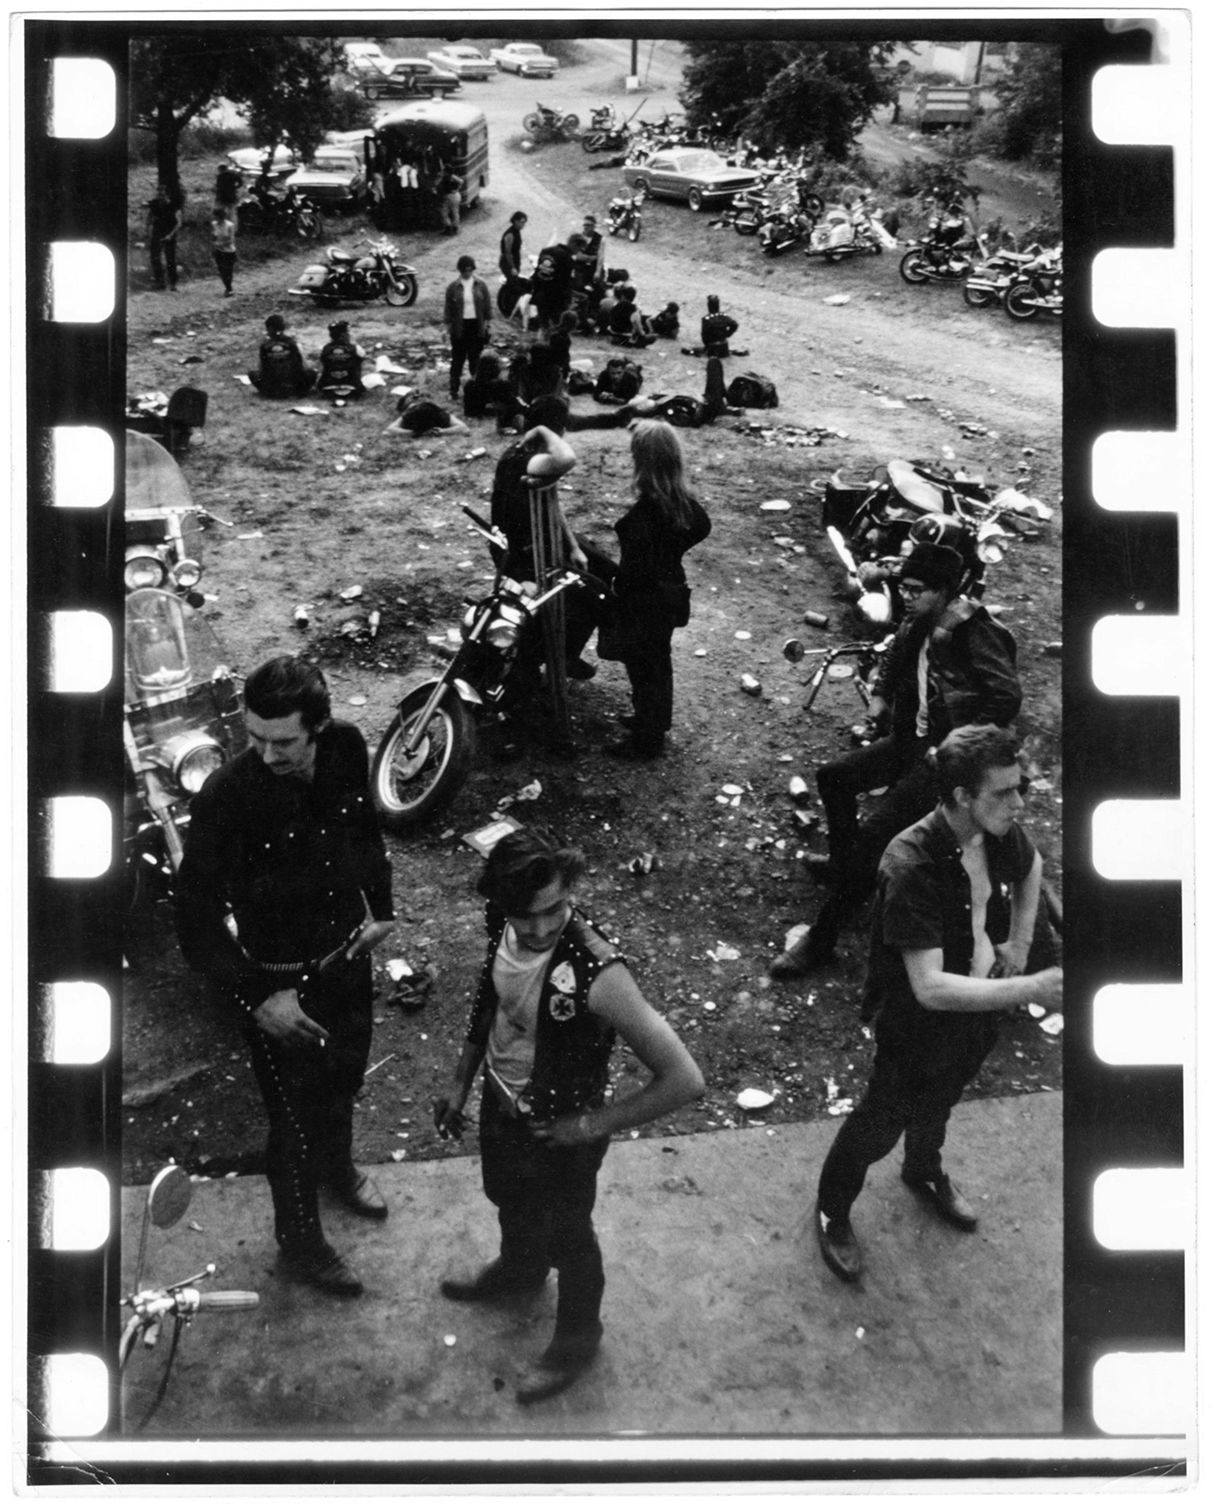 Copyright Danny Lyon / Magnum Photos, Dayton, Ohio, from The Bikeriders, 1966